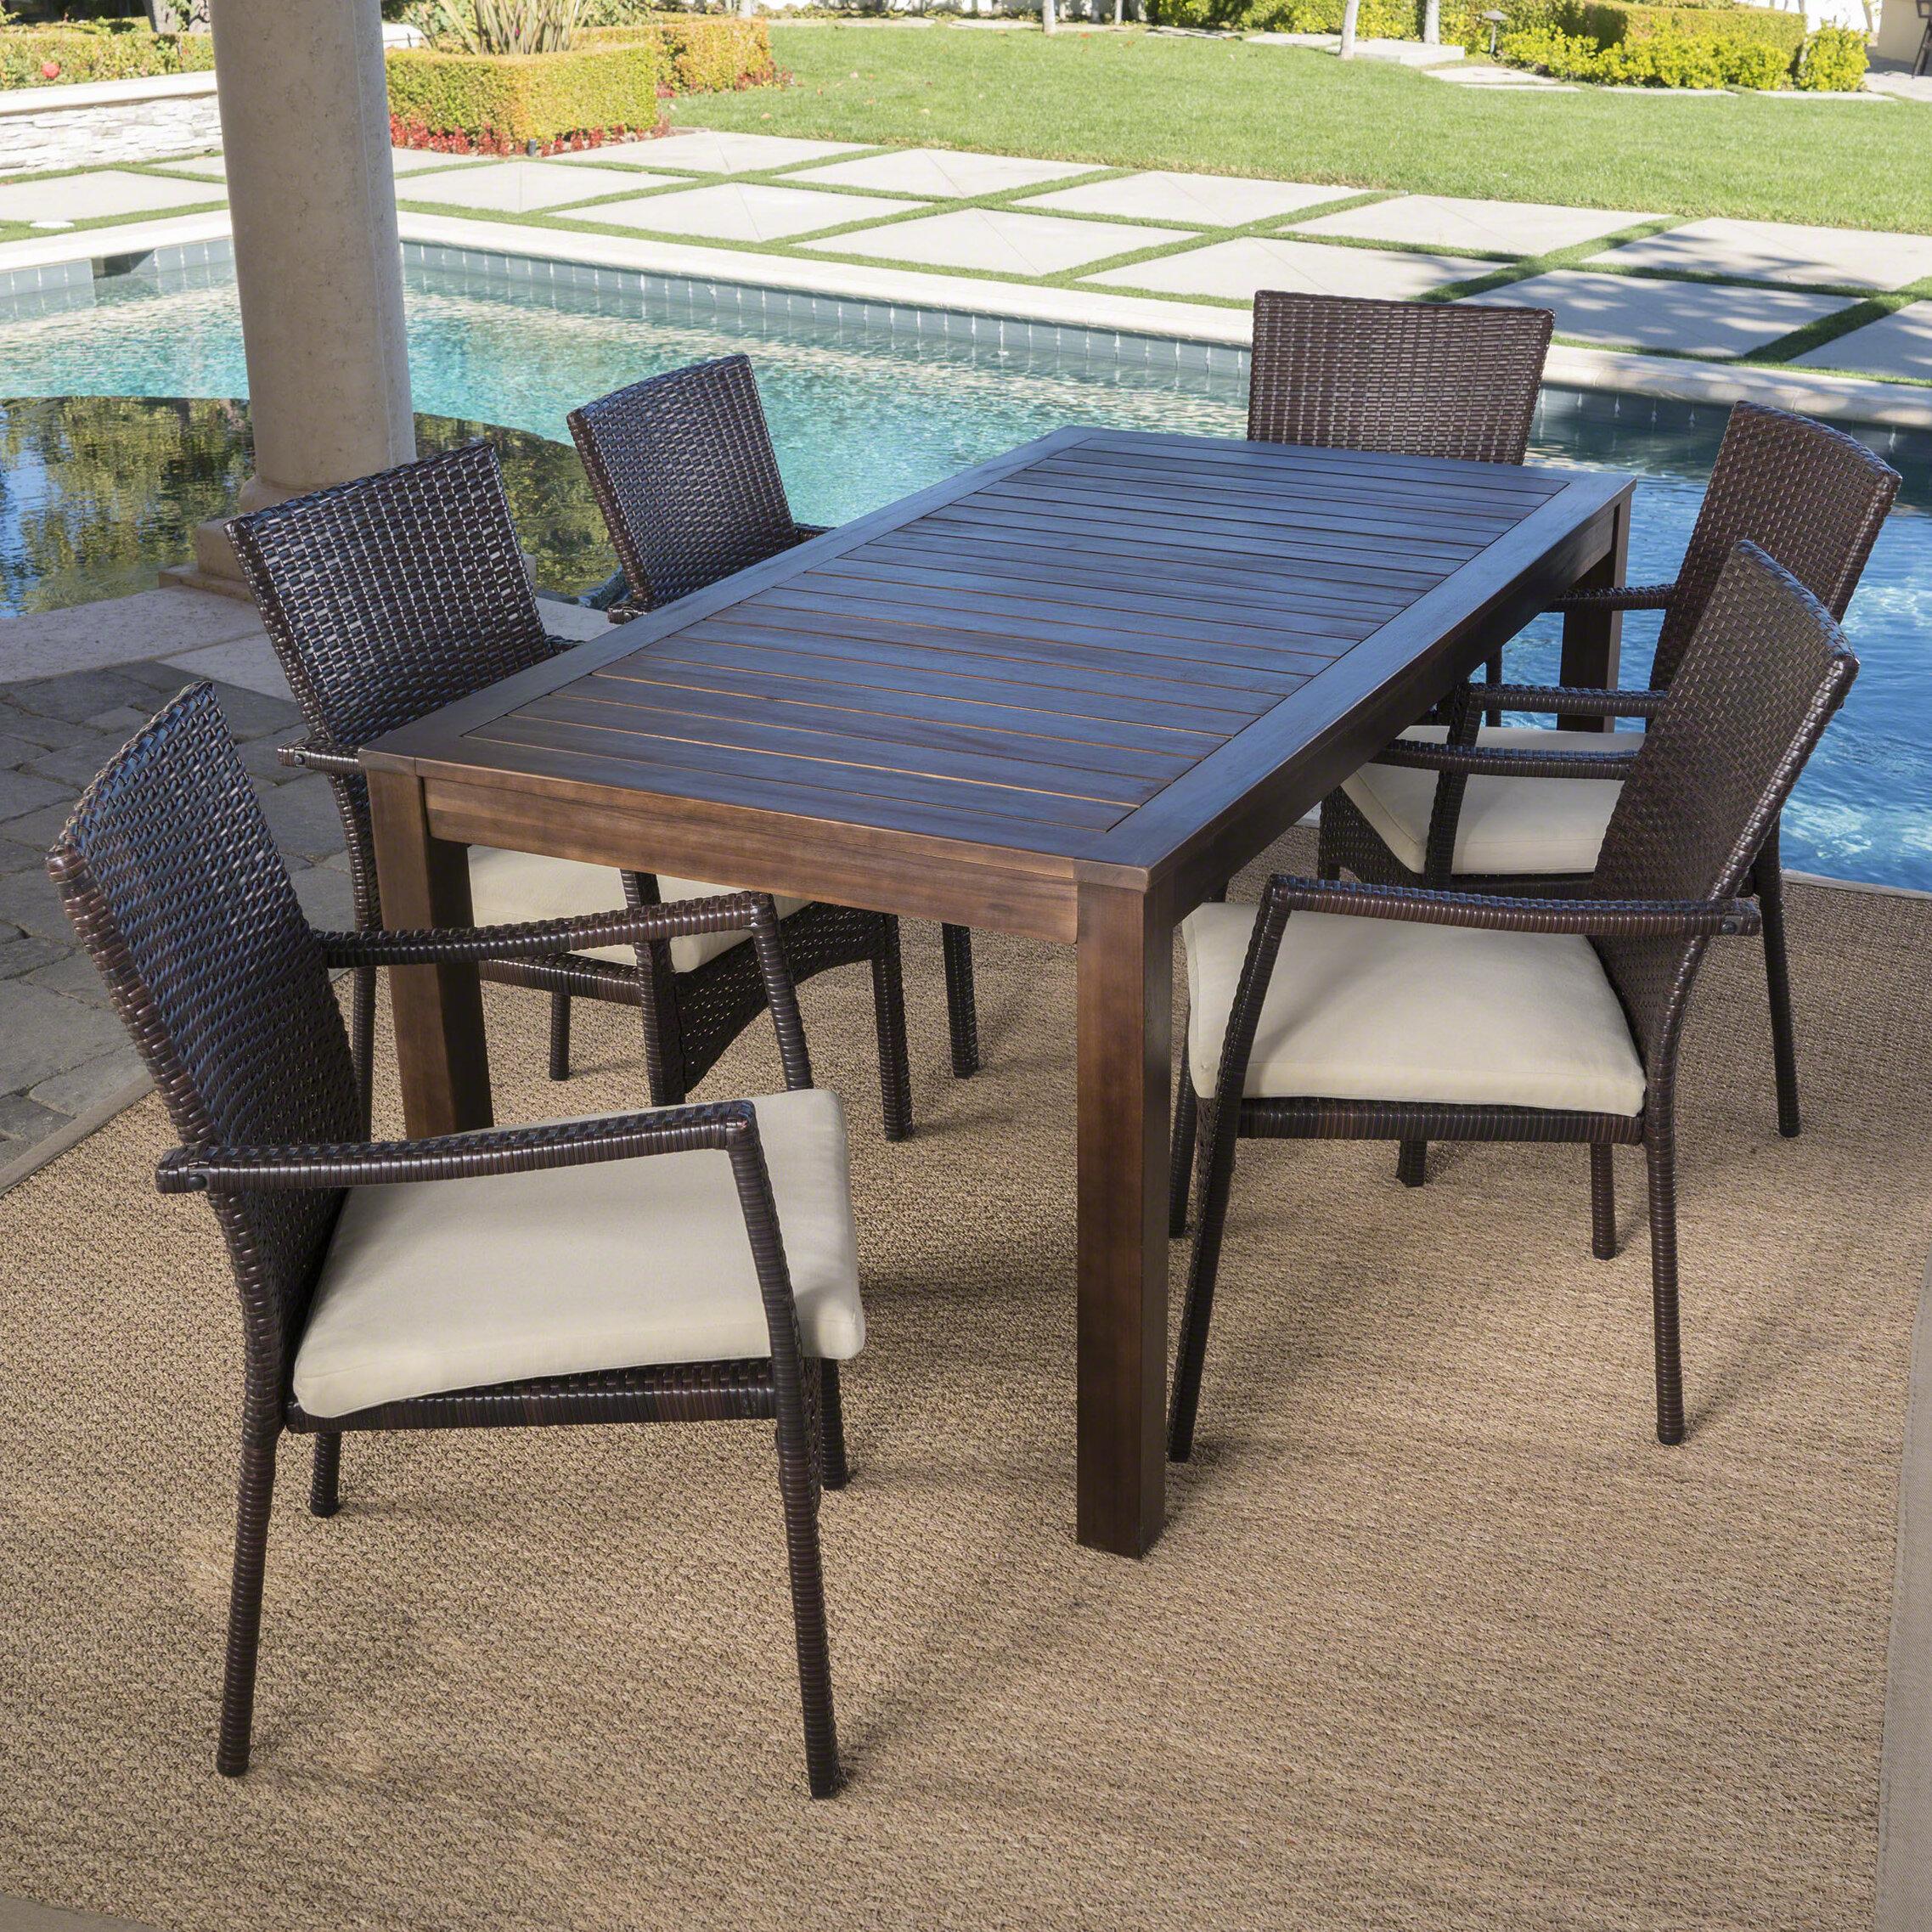 Charlton Home Avenir Outdoor Wood Wicker 7 Piece Dining Set With Cushions Reviews Wayfair